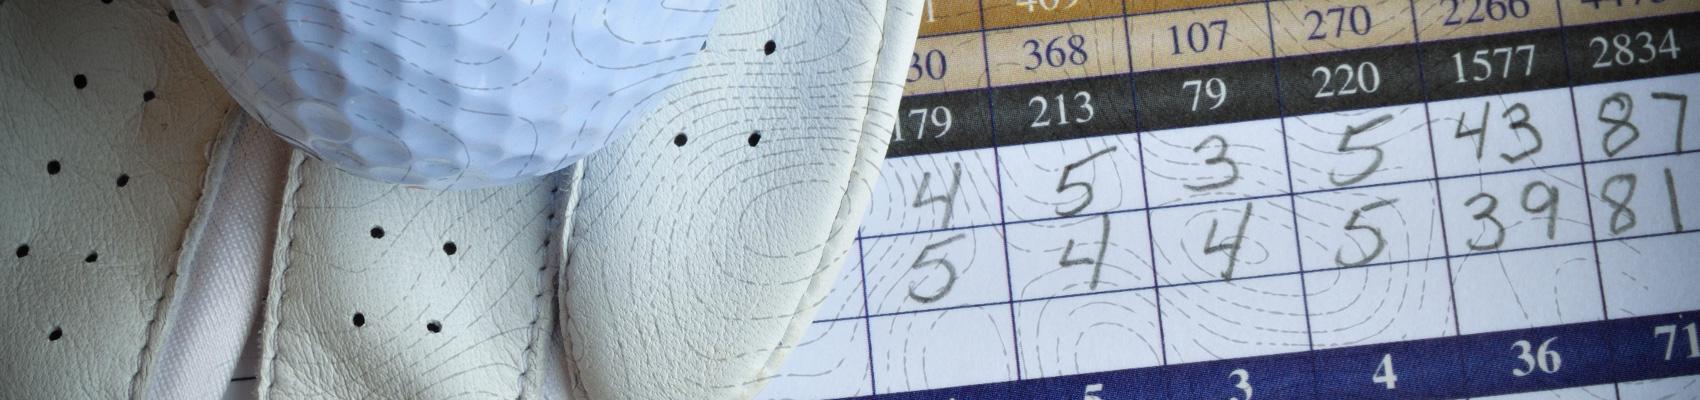 golfing tee times urbandale des moines iowa